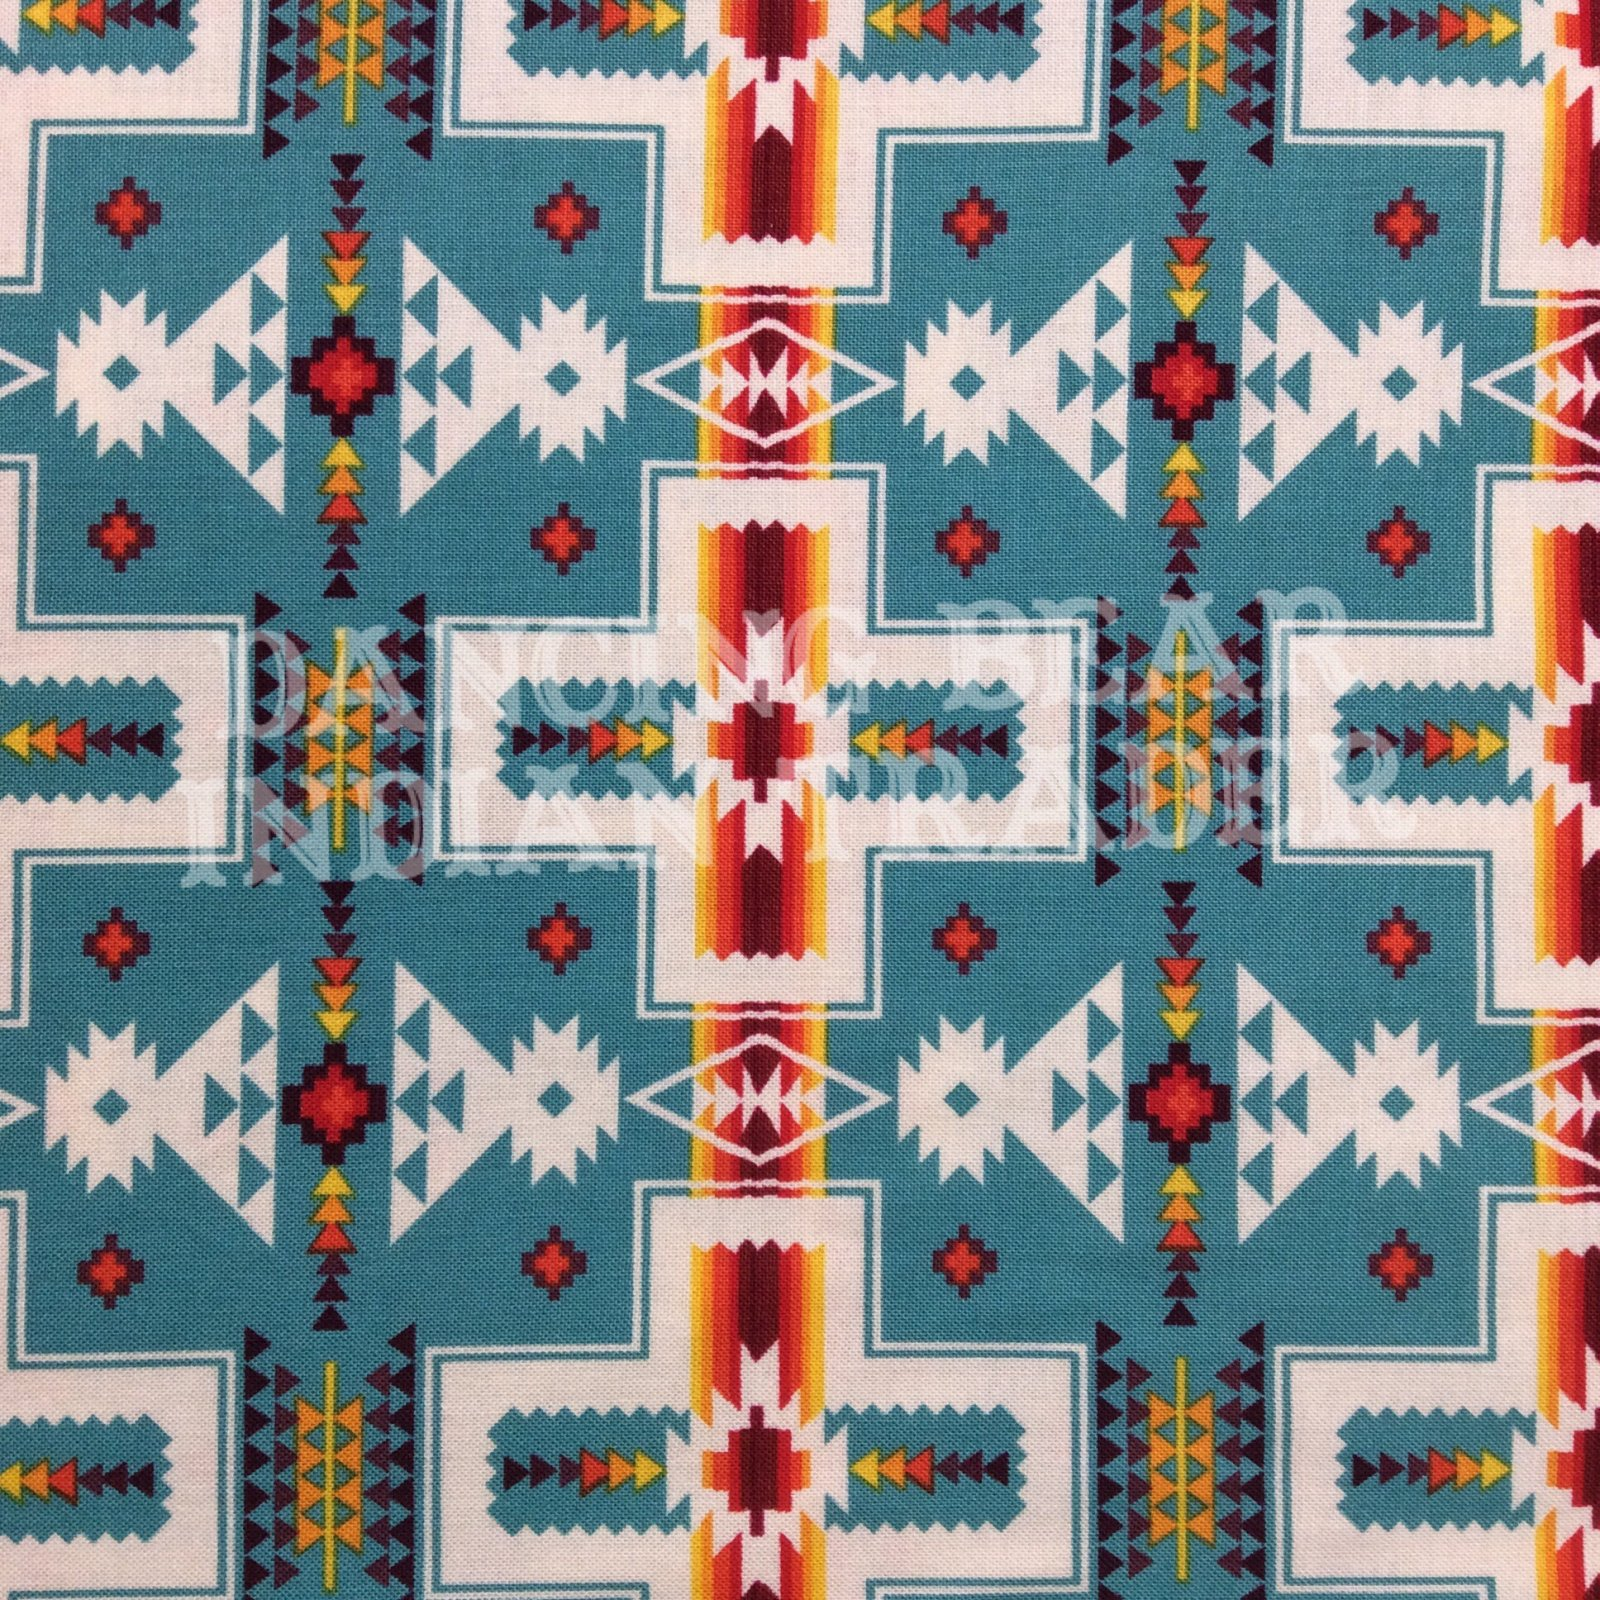 Native Pattern Blanket Turquoise -Back in stock August/September 2020